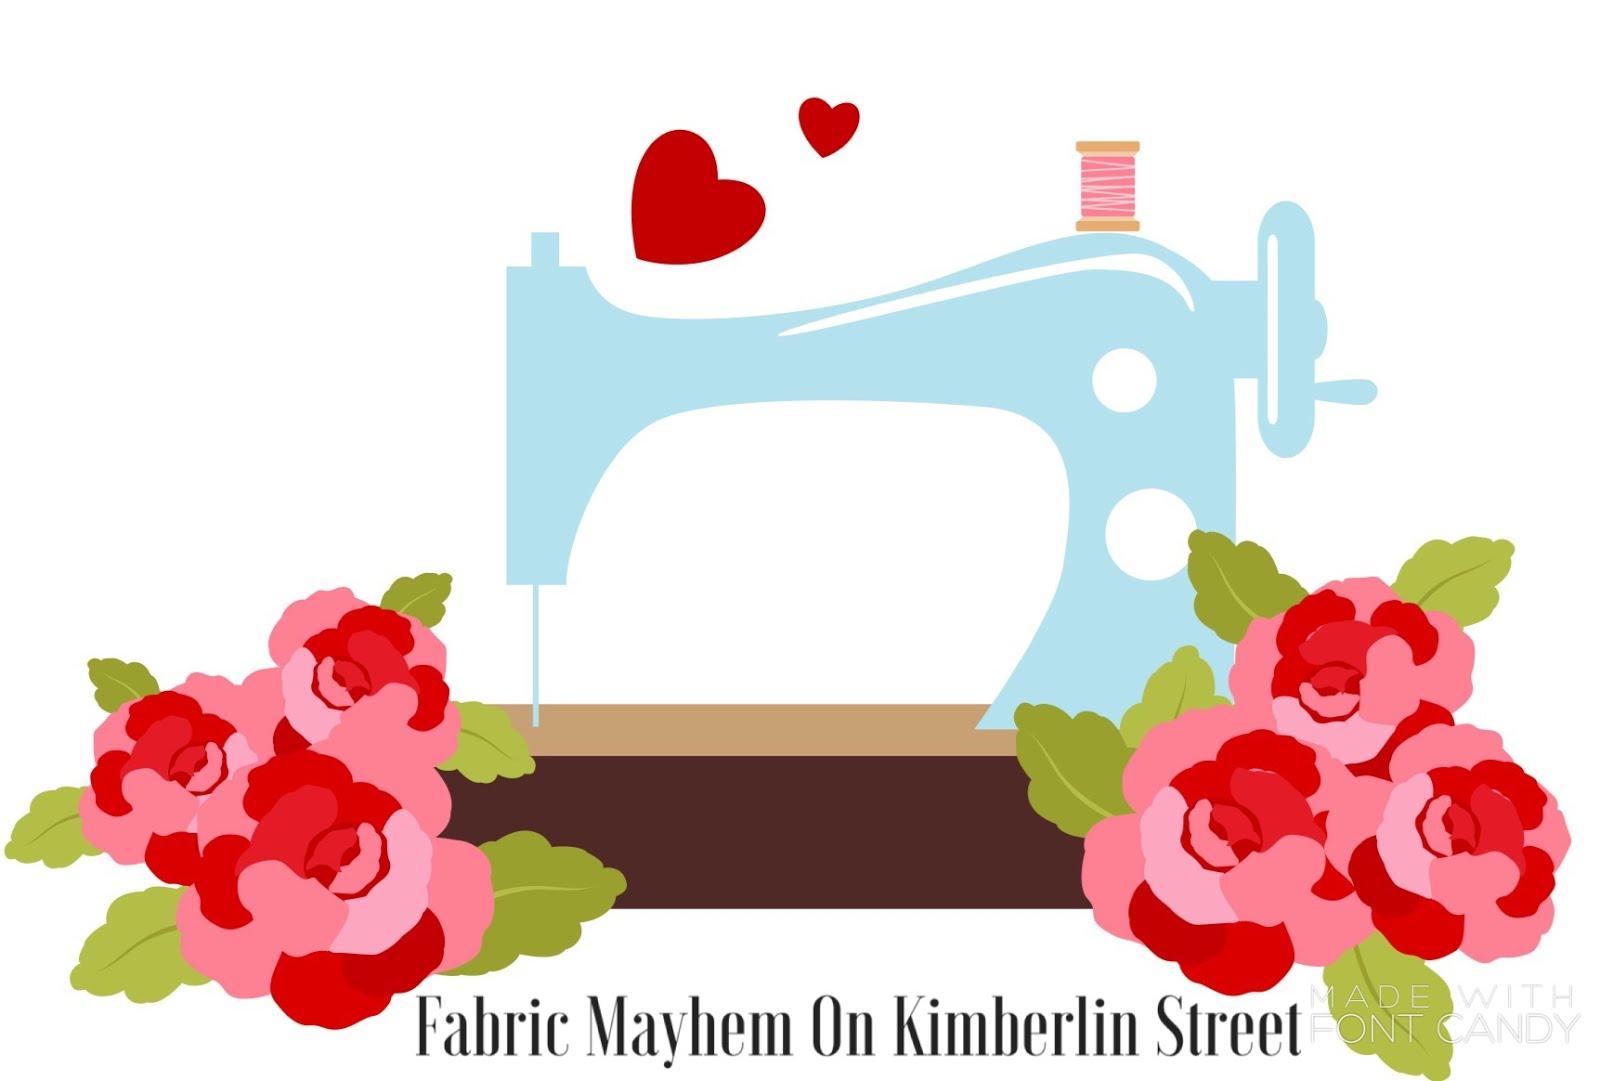 Fabric Mayhem on Kimberlin Street